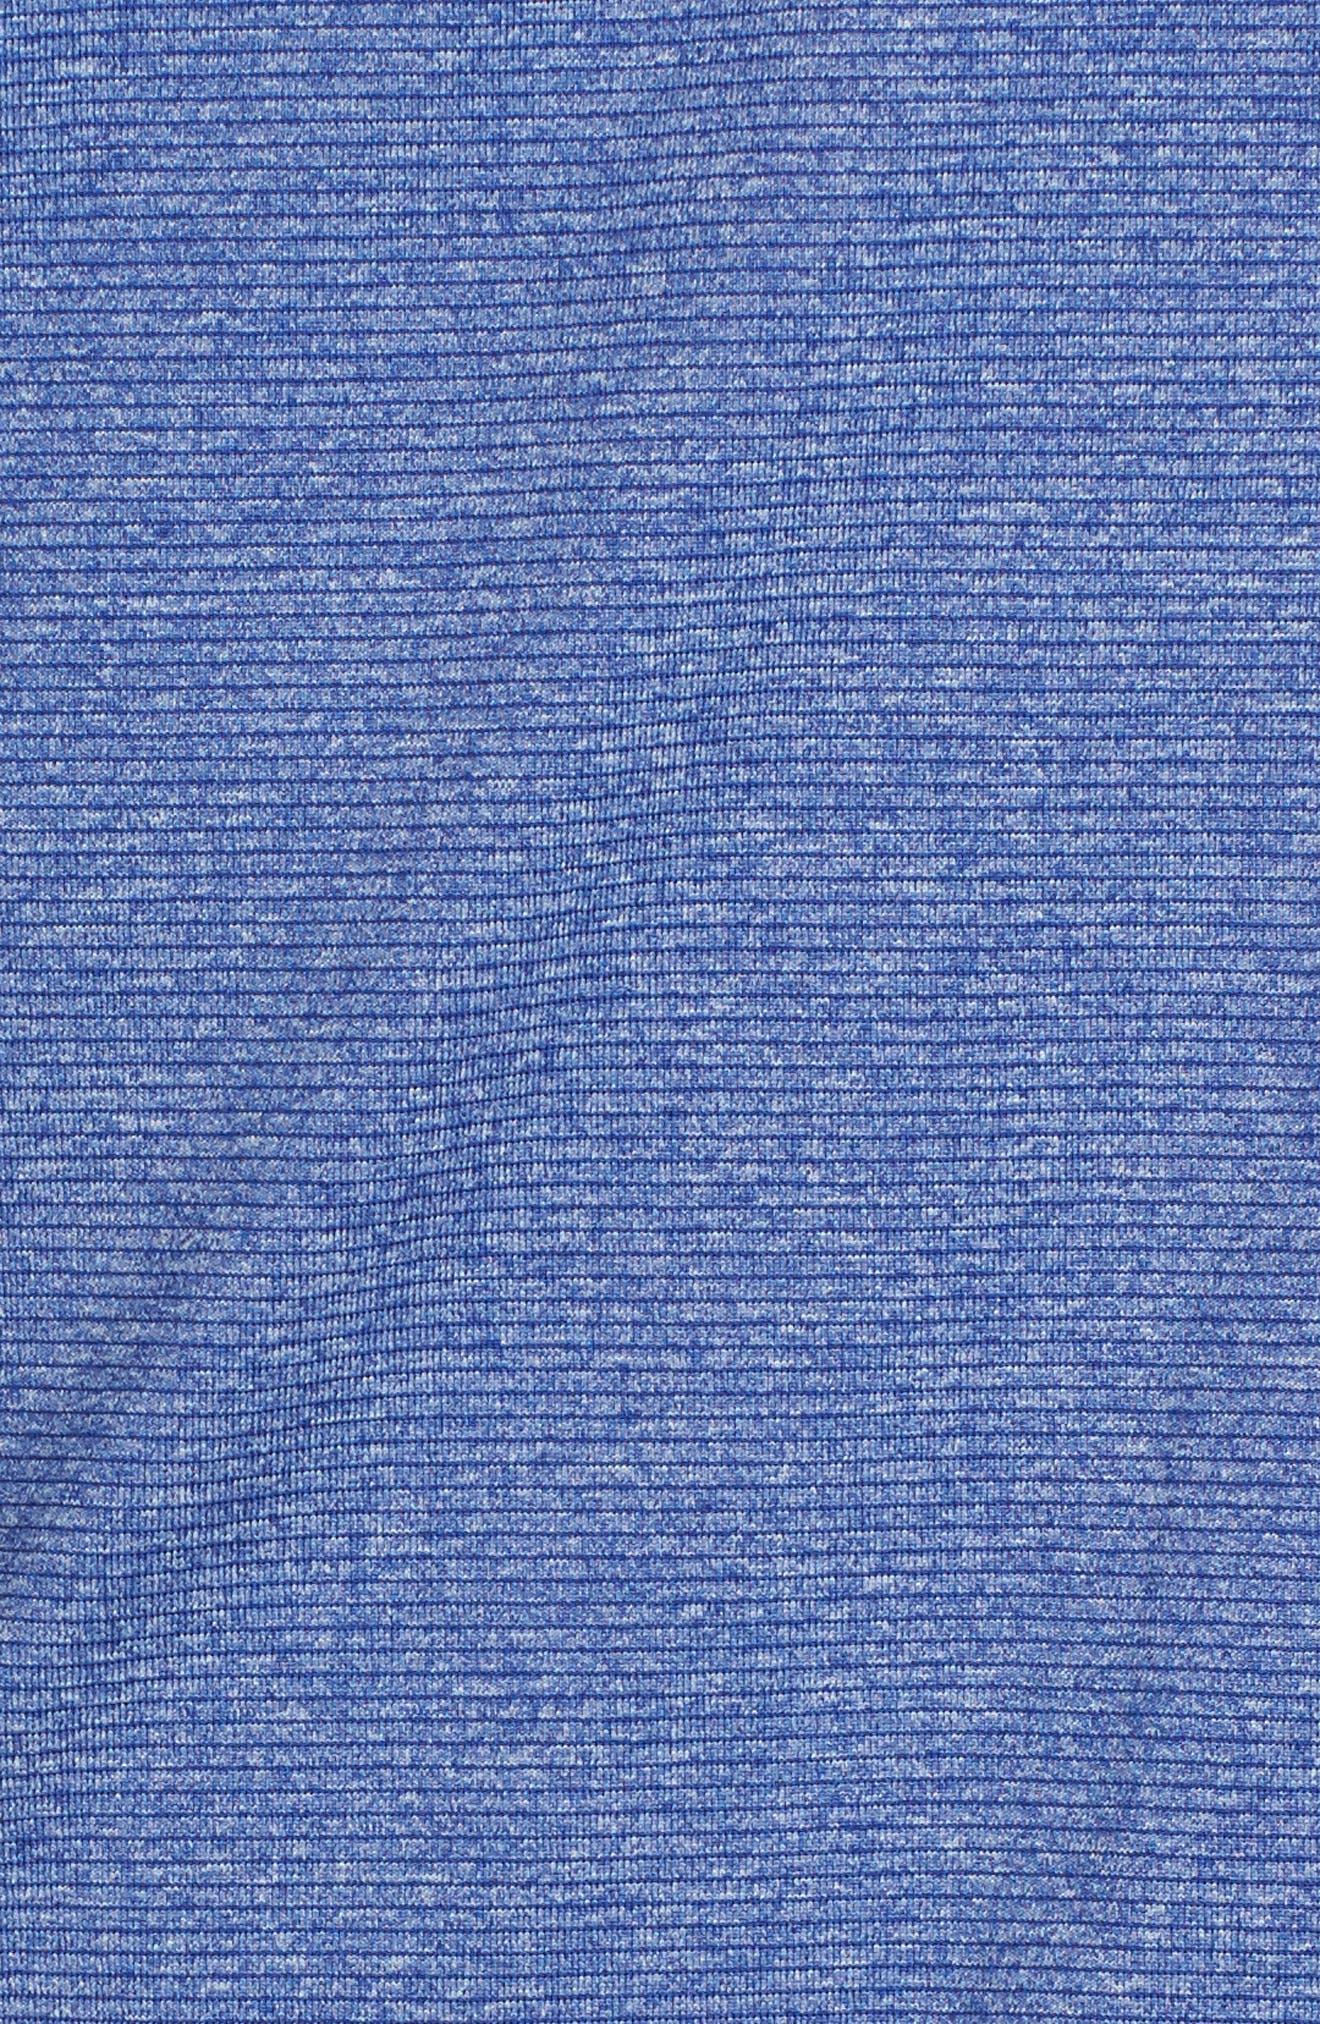 Shoreline - Indianapolis Colts Half Zip Pullover,                             Alternate thumbnail 5, color,                             Tour Blue Heather